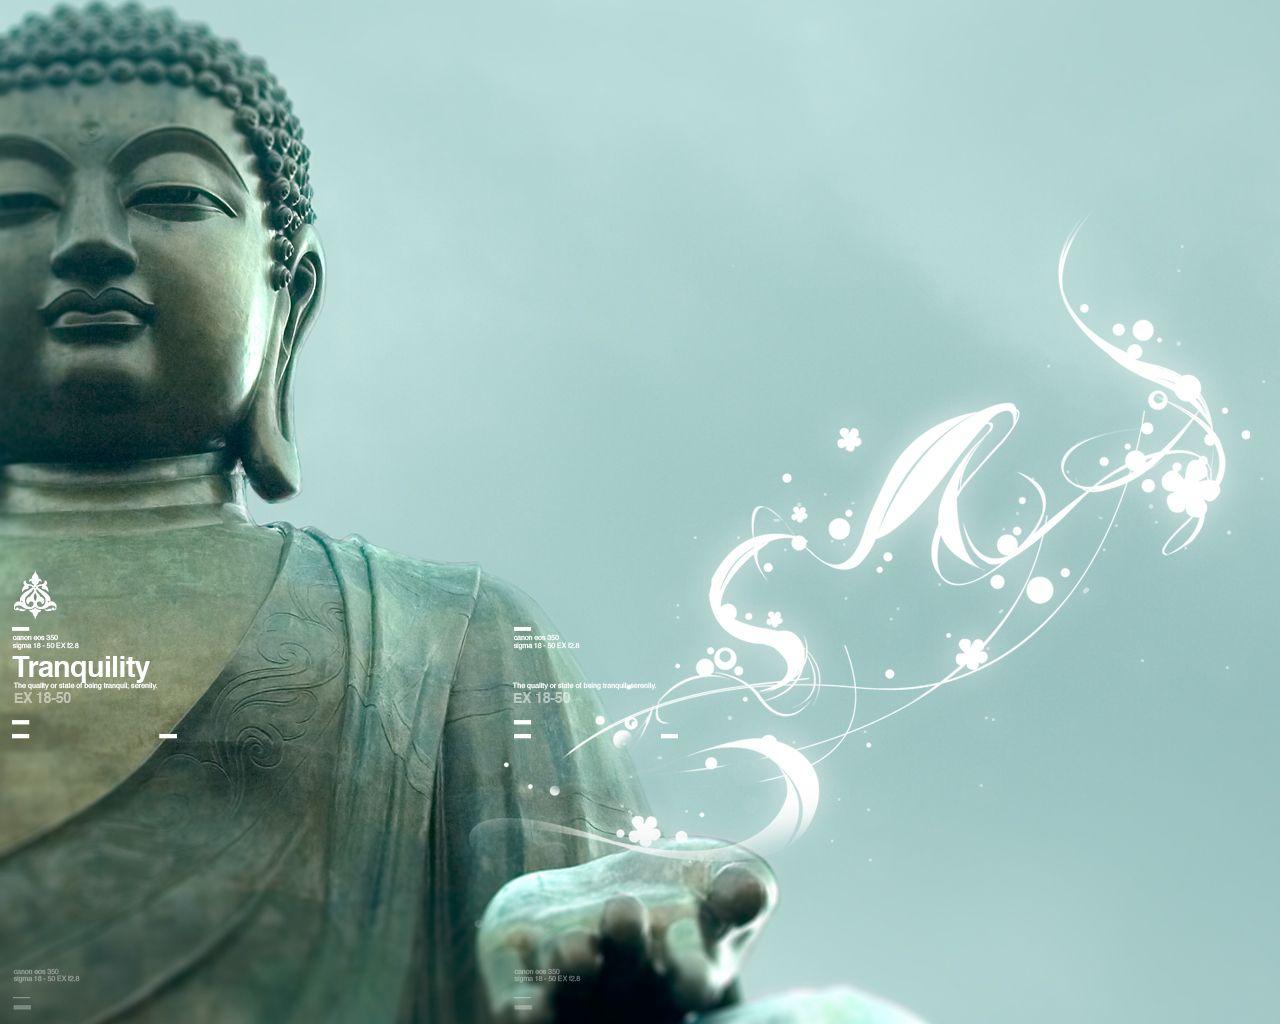 Lord Buddha Hd Wallpapers Free Wallpaper Downloads Lord Buddha